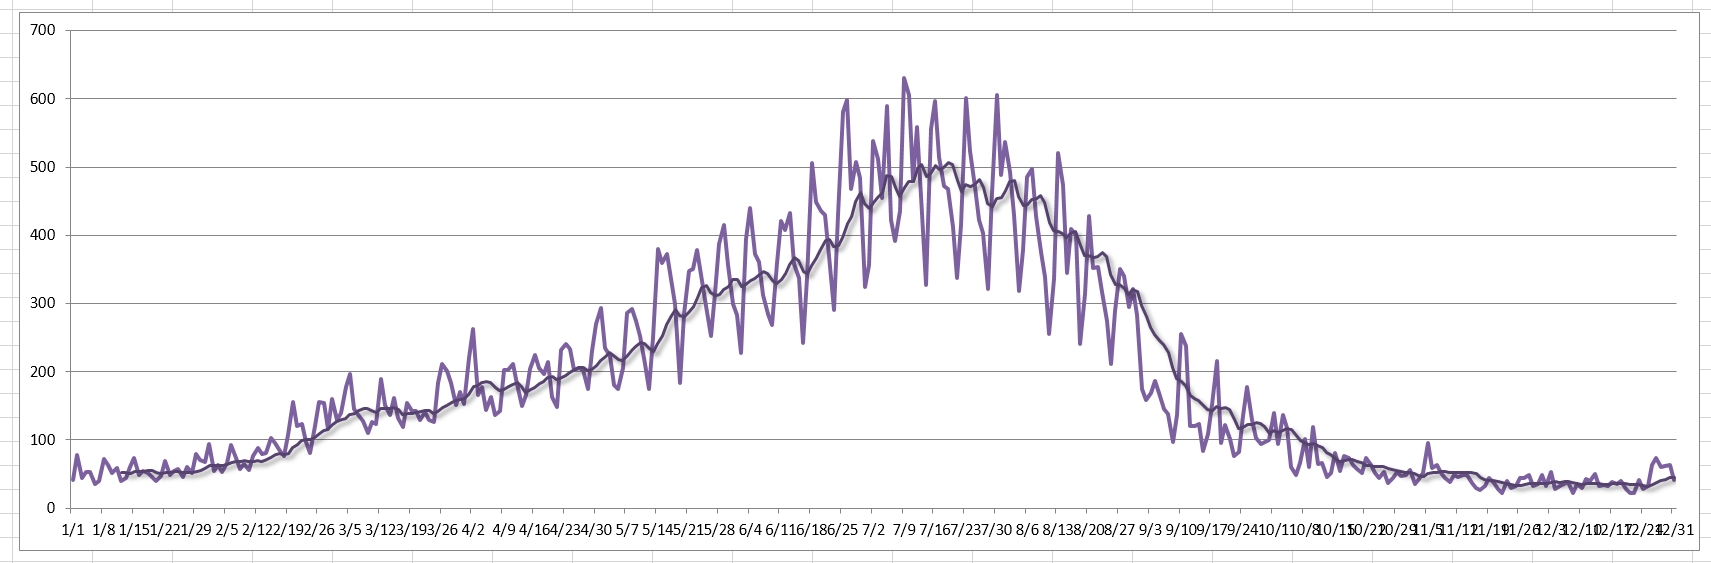 Adding a 12 month trendline in excel 2013 jeff proms sql server blog ccuart Gallery